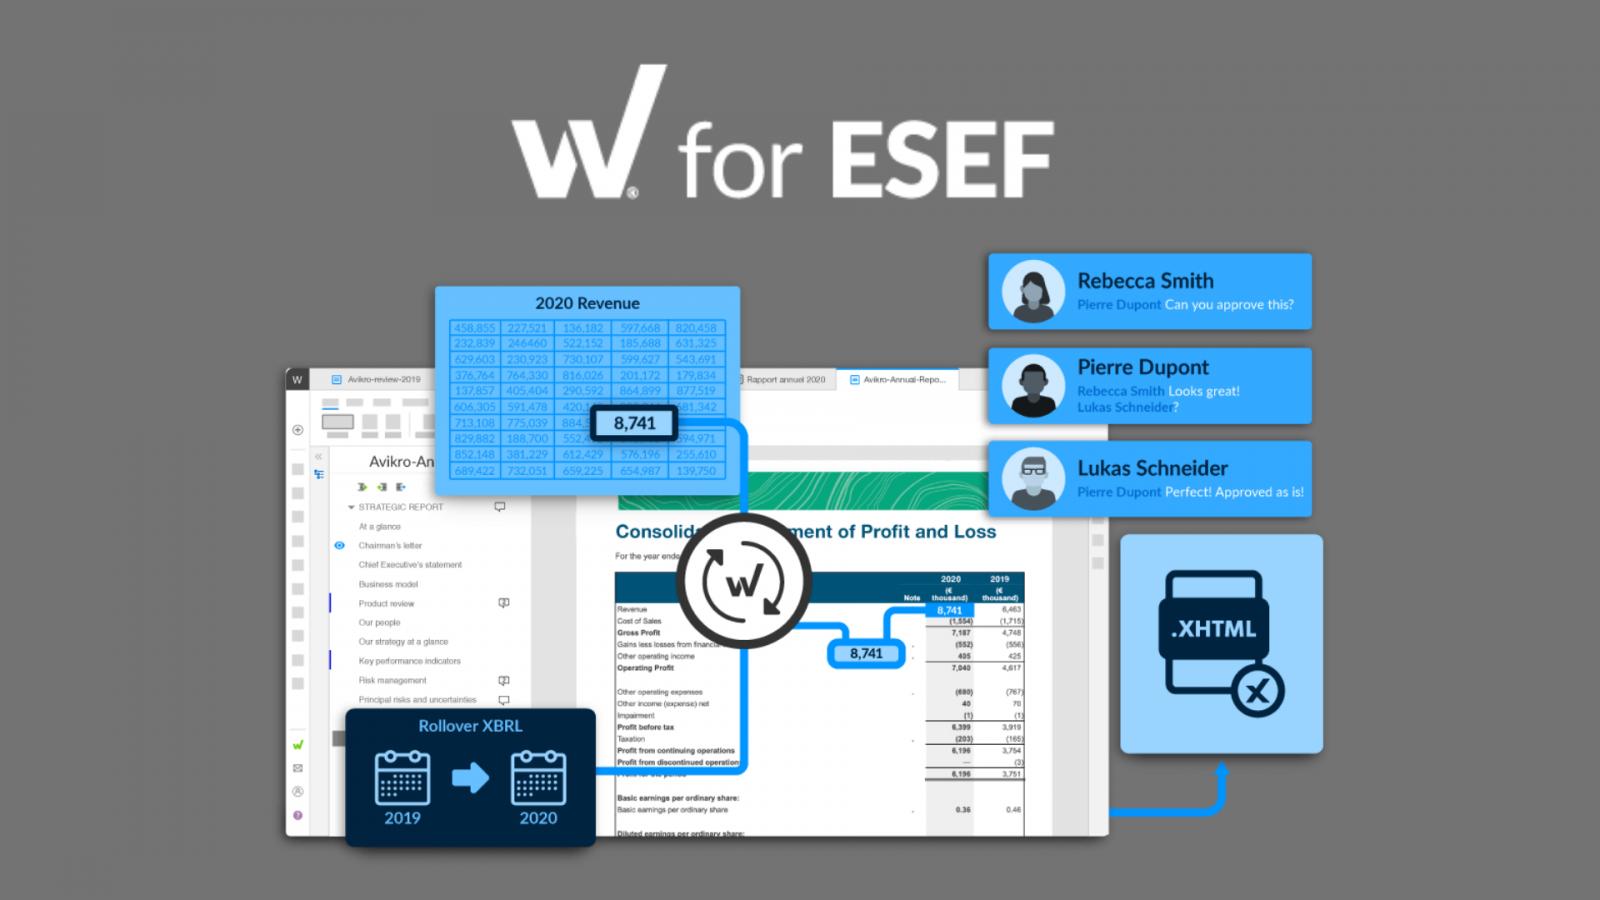 W for ESEF webinar